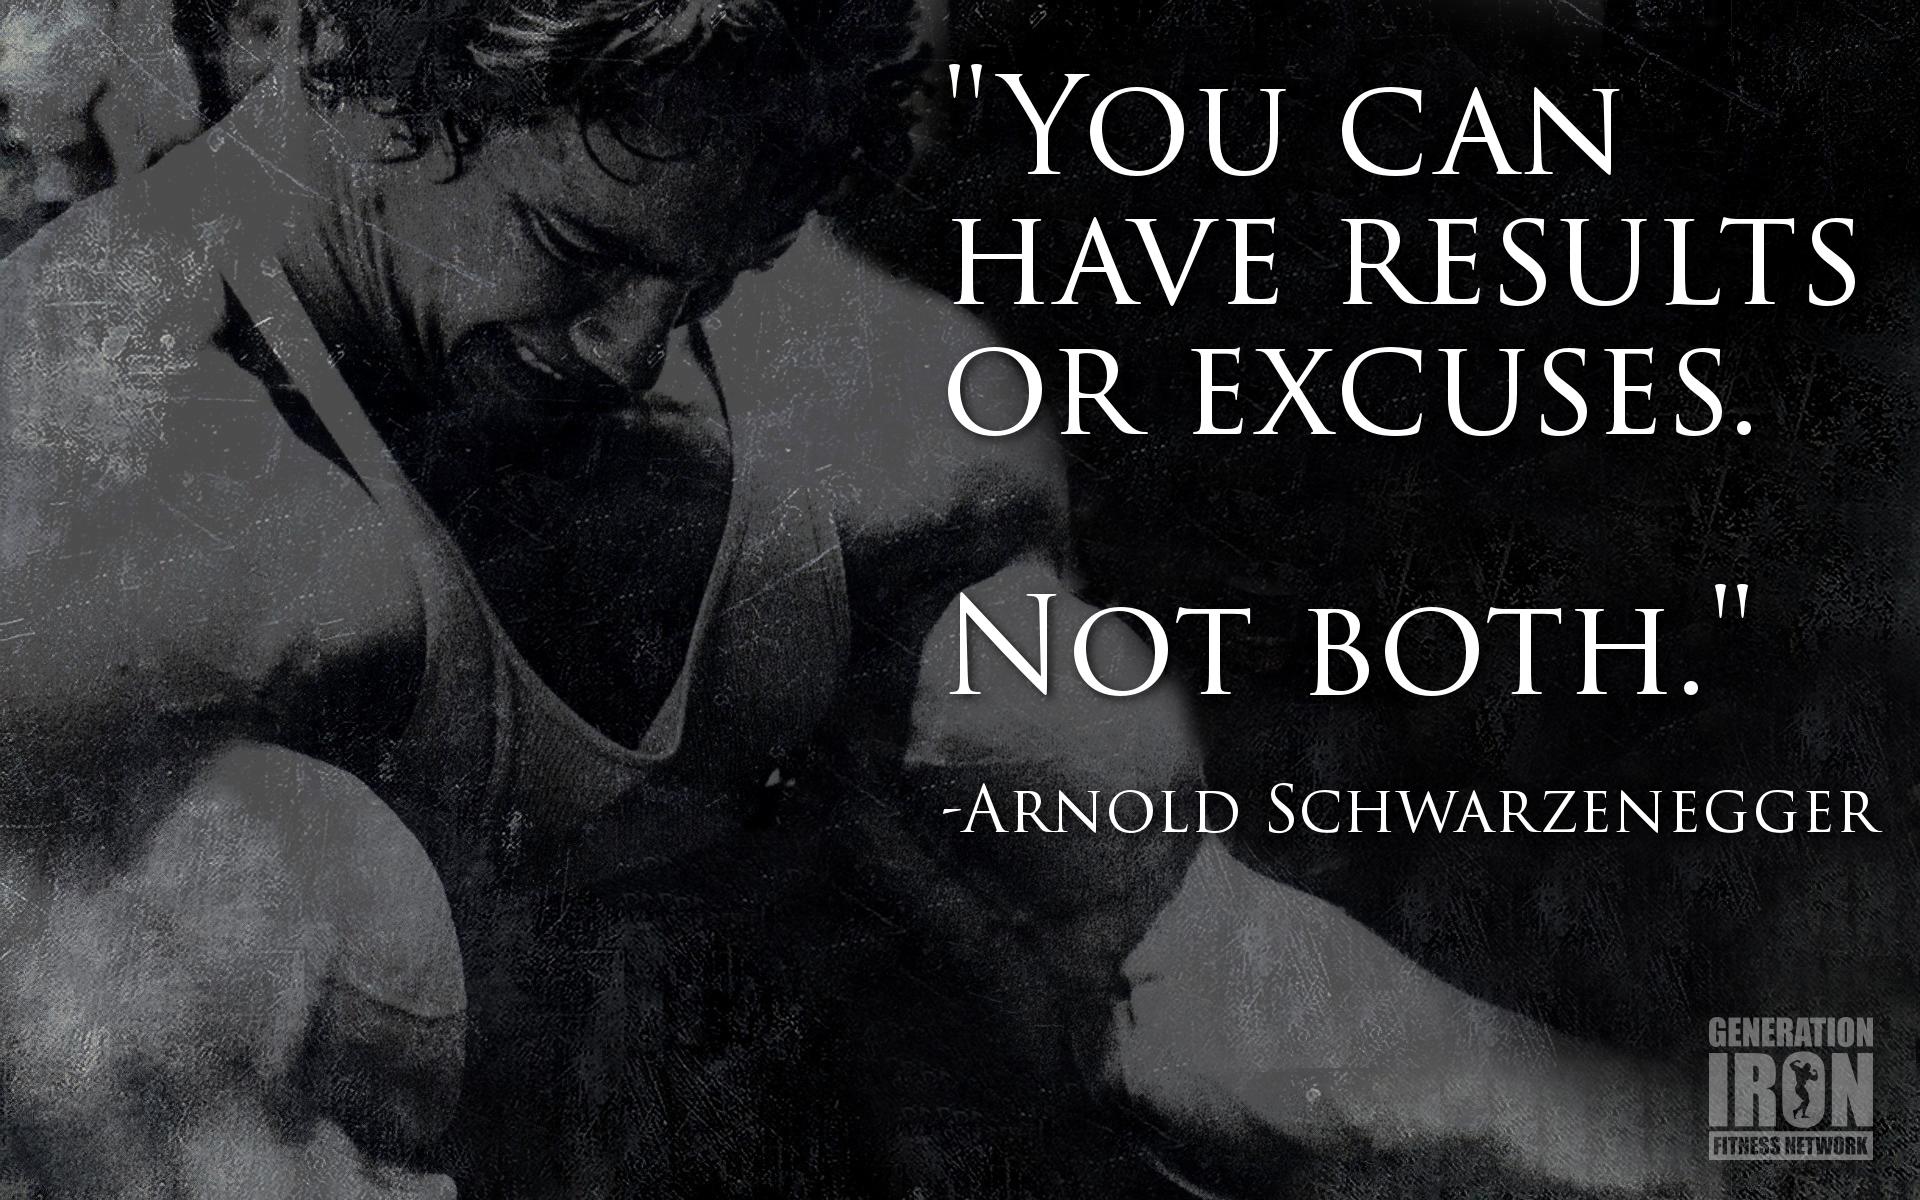 Free Download Generation Iron Arnold Schwarzenegger Quote